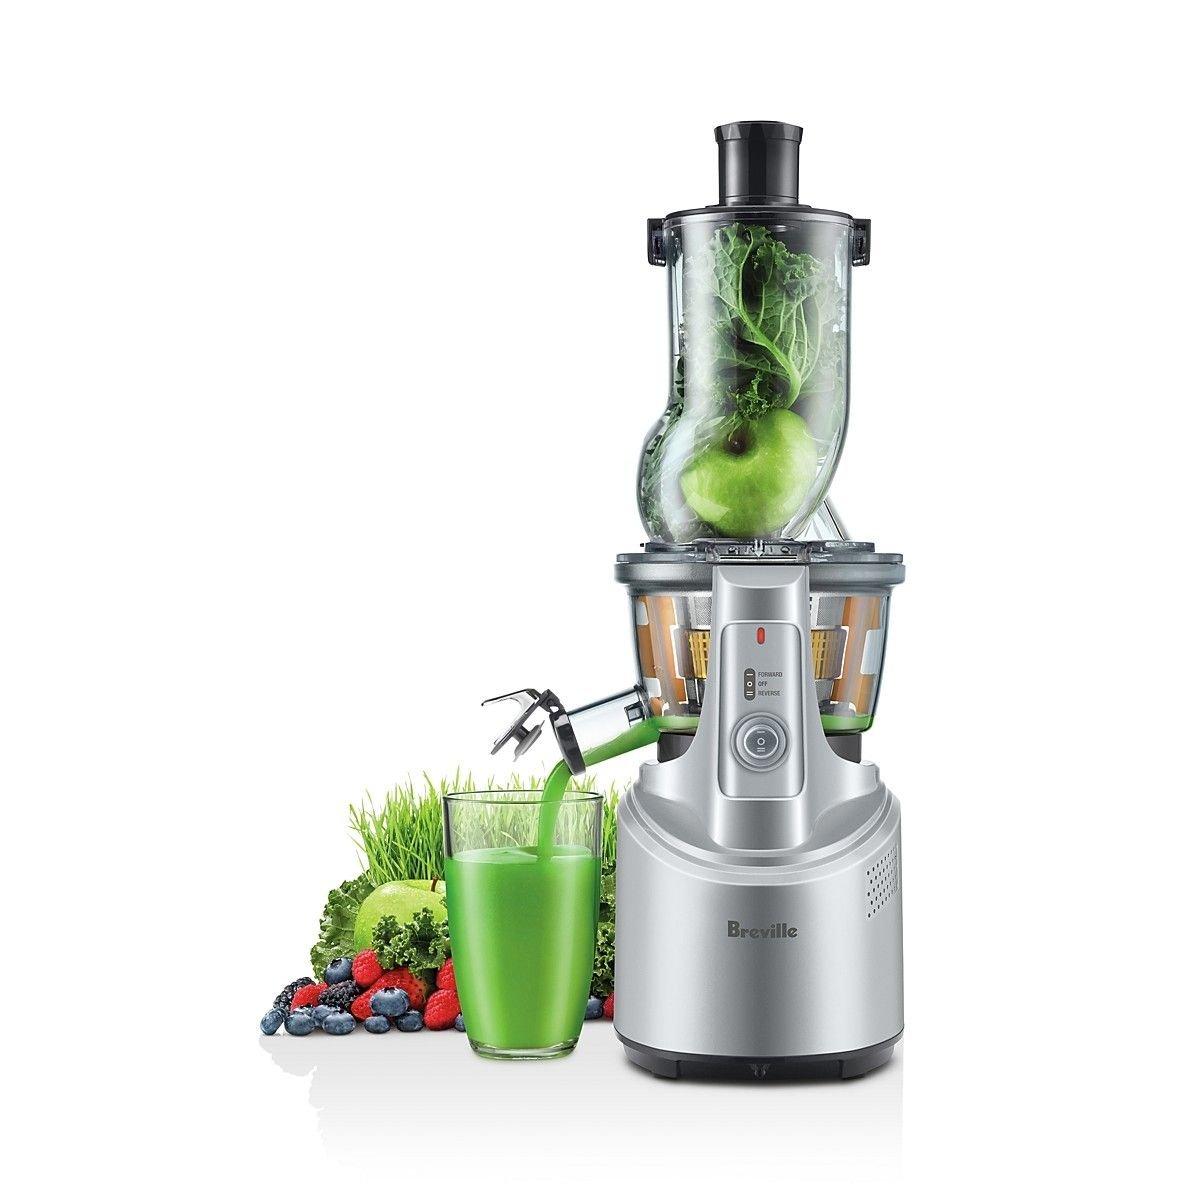 Breville Juice Fountain Juicer Model: JE98XL